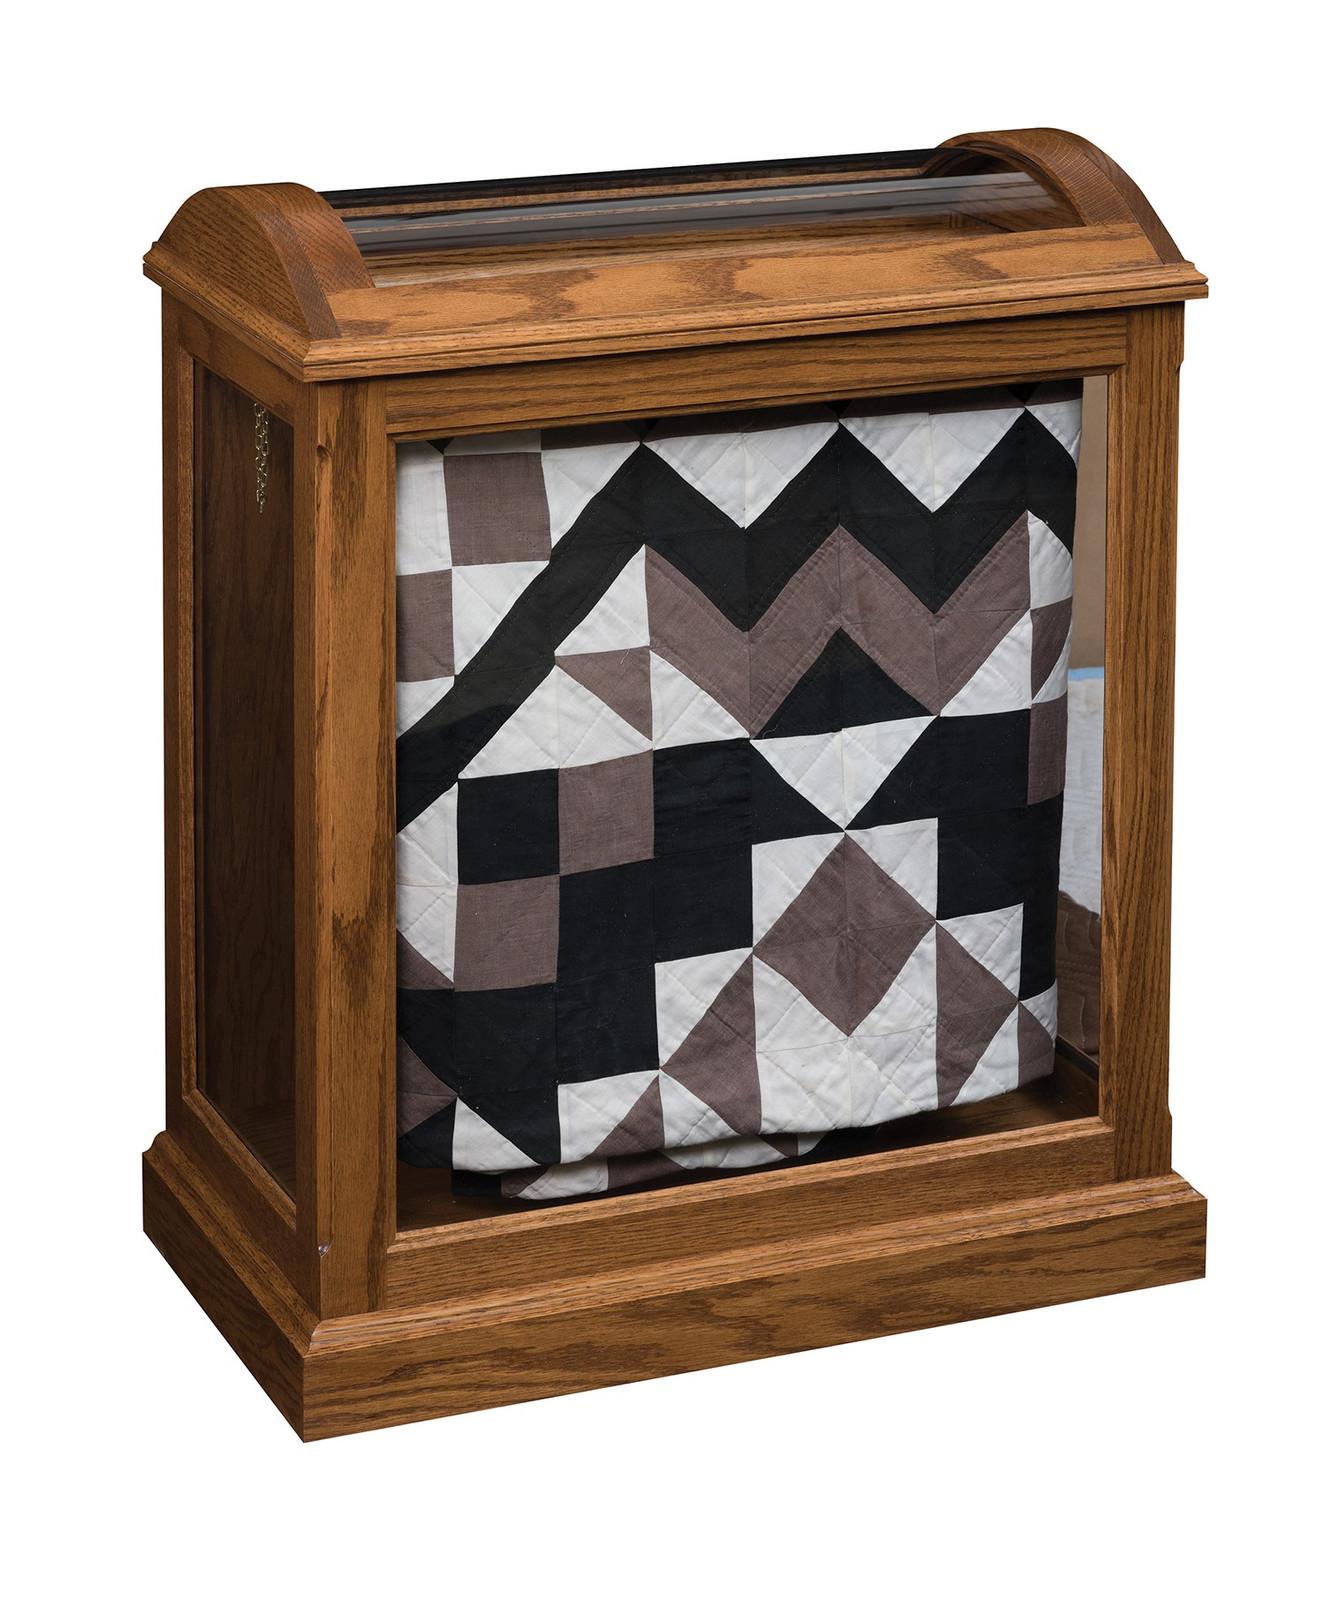 Rustic Furniture Jenners Pa